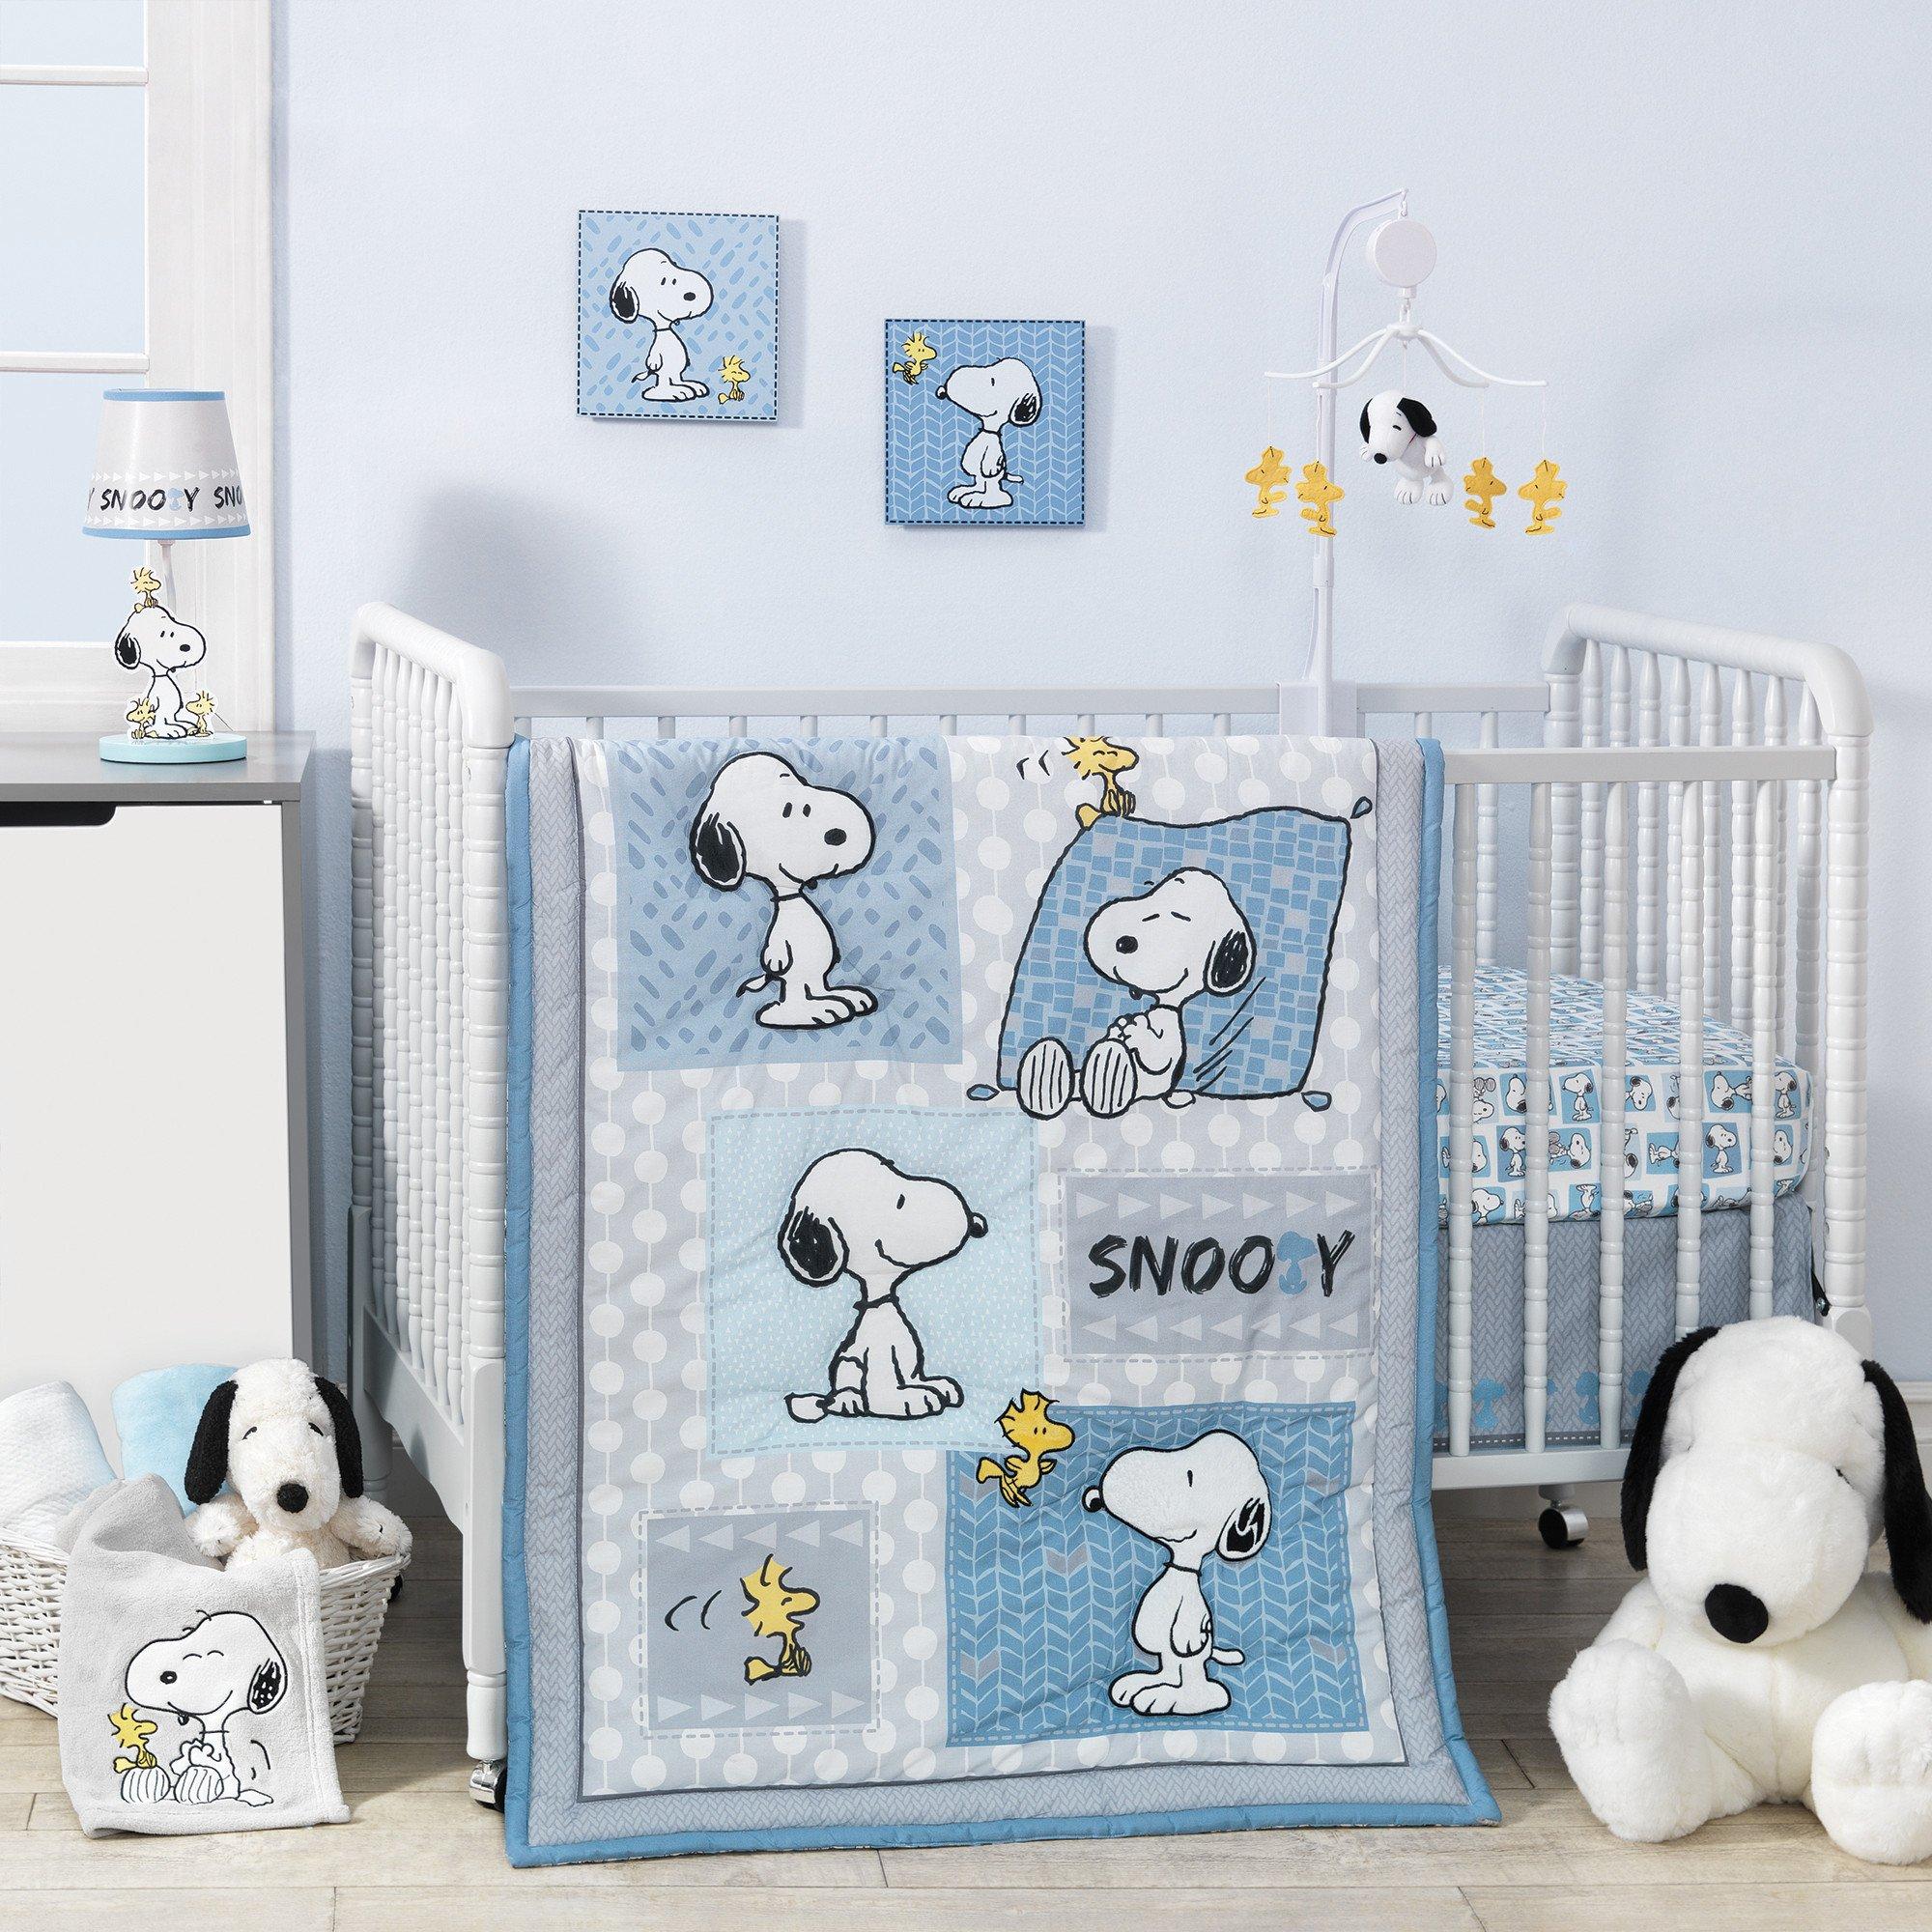 Bedtime Originals Forever Snoopy 3 Piece Crib Bedding